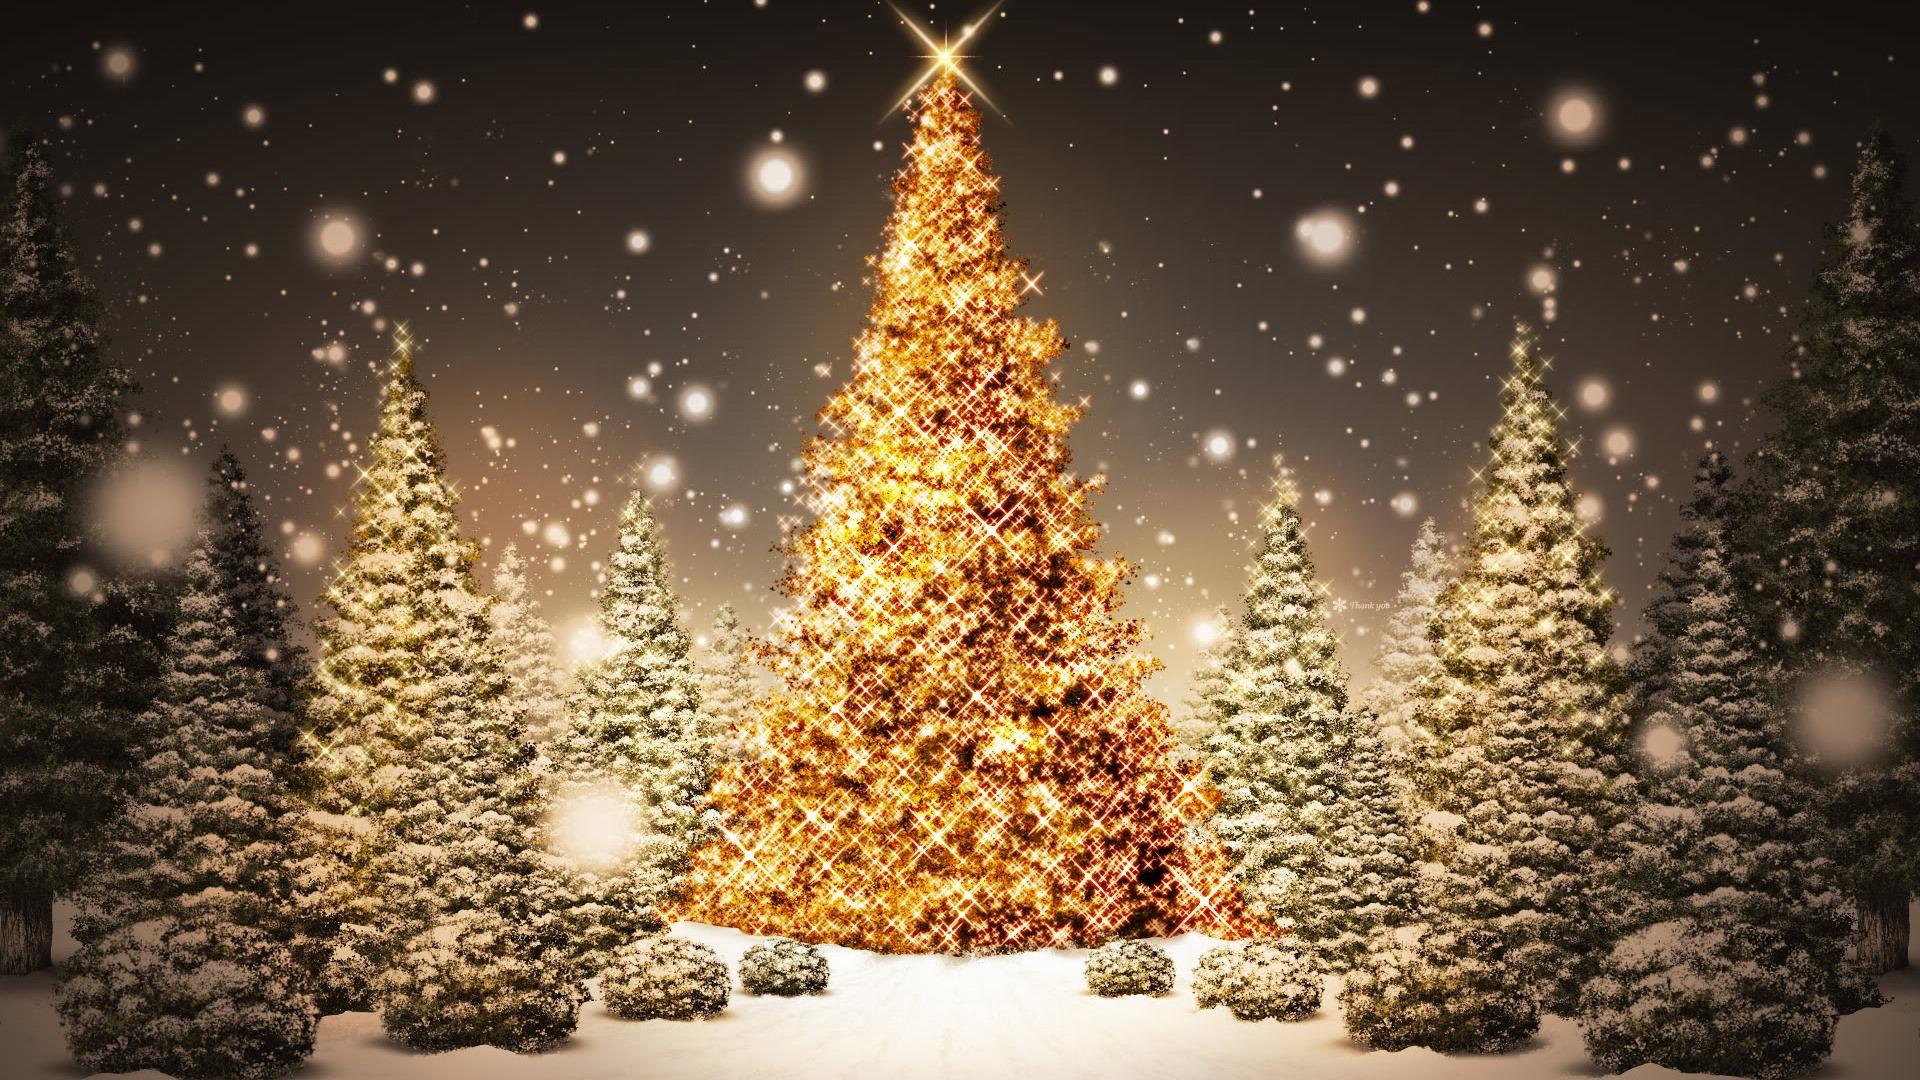 Christmas Images Pondering Principles